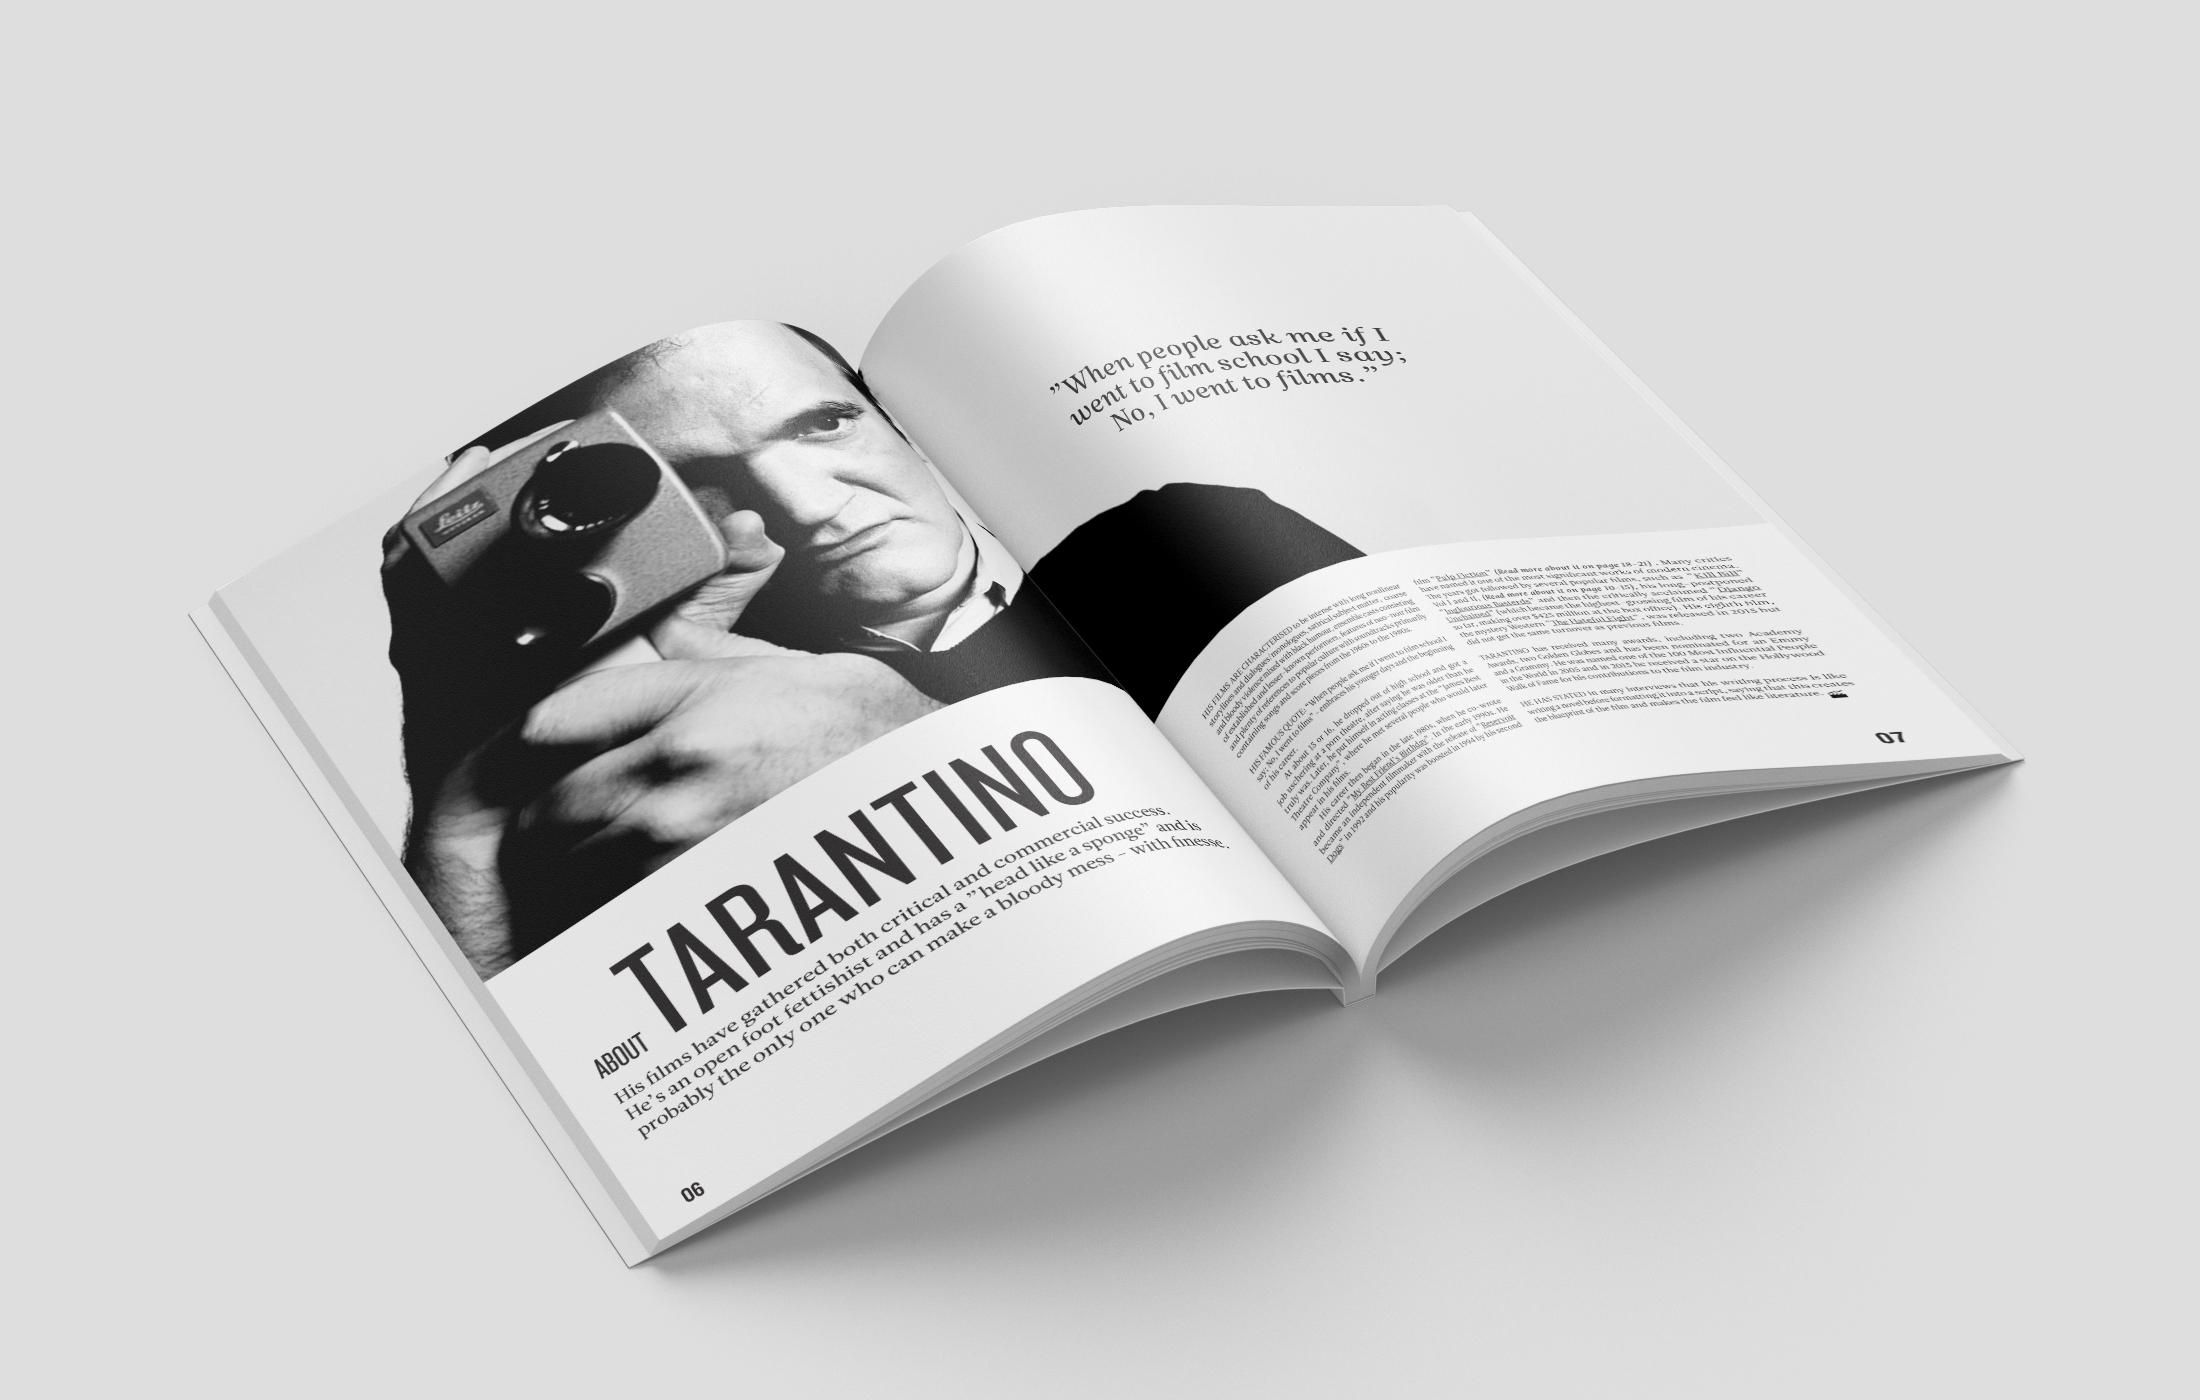 Tarantino_BTS_LisaLiljenberg_CilantroStudios.jpg